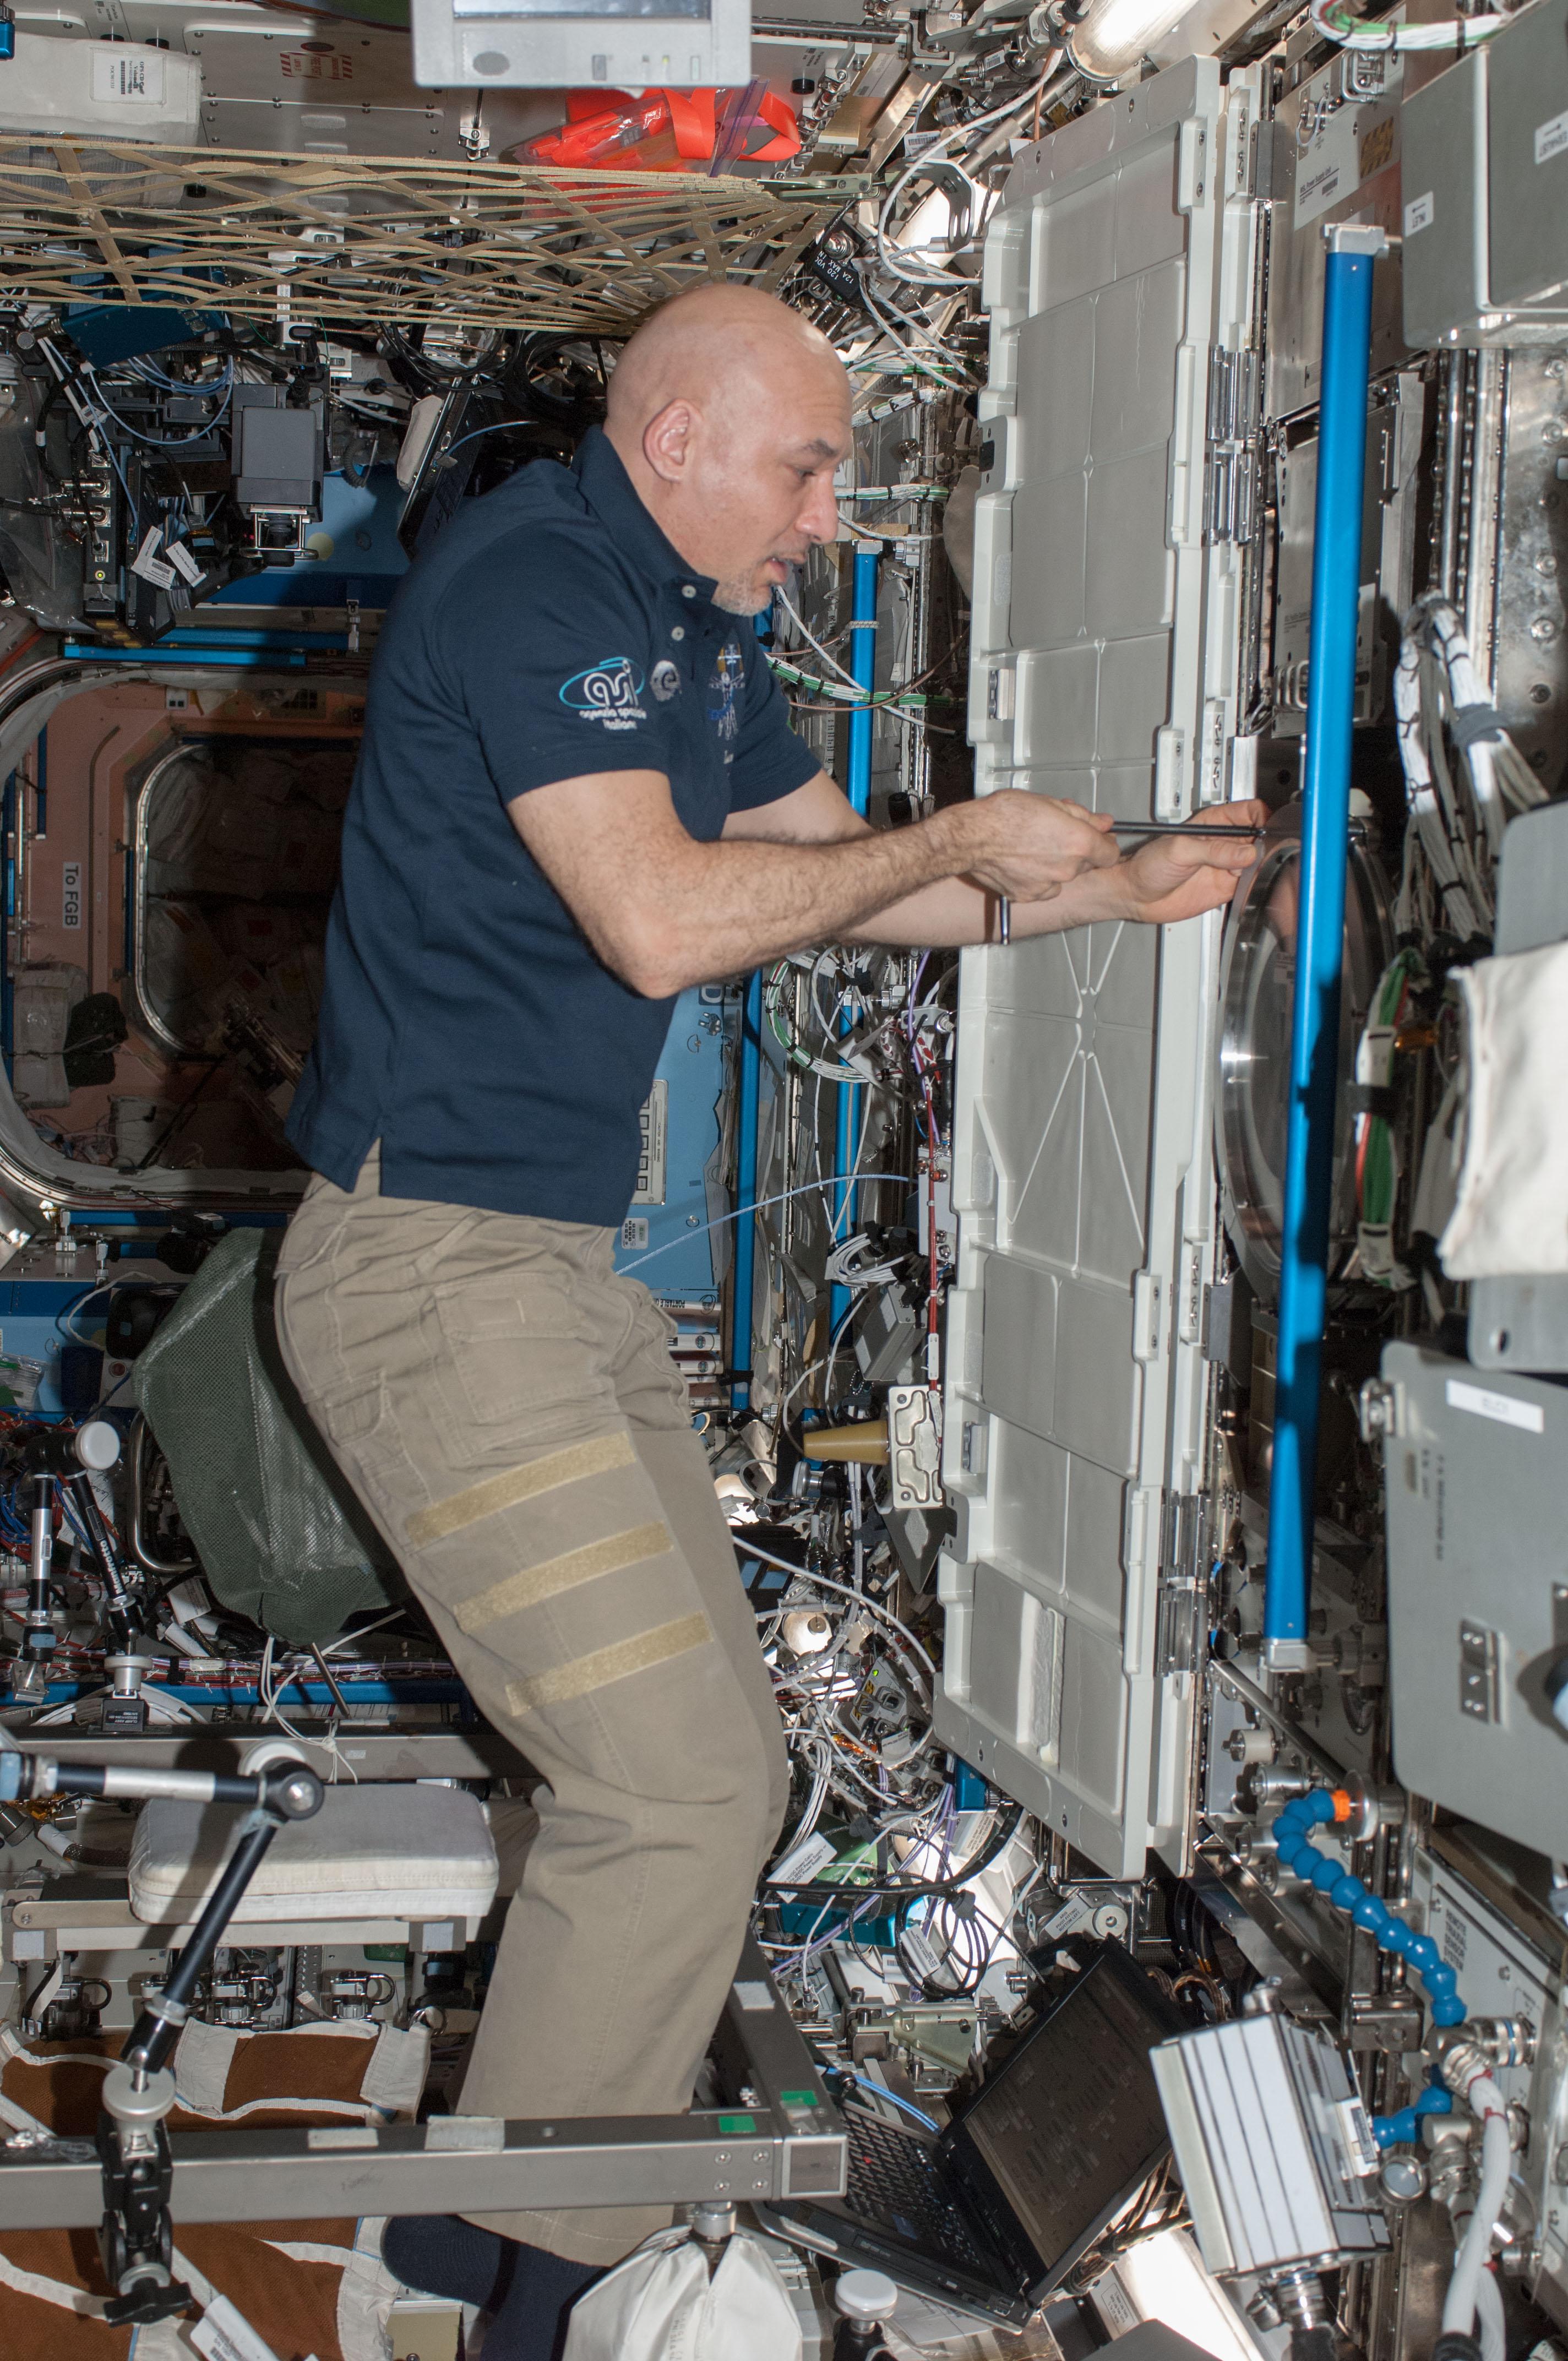 european space agency astronaut jobs - photo #22